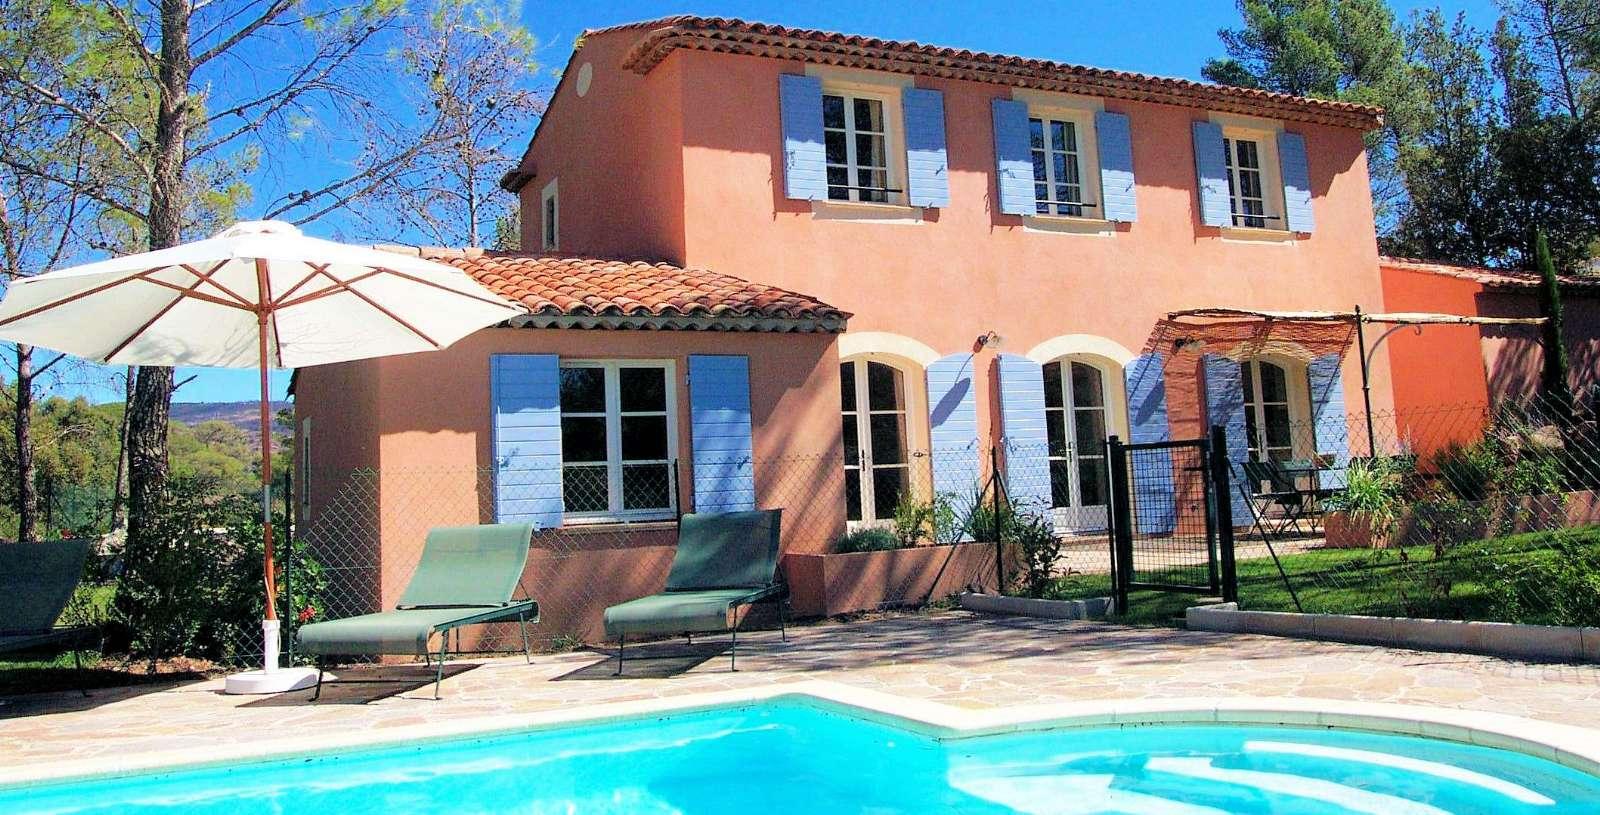 <a href=http://www.in-france.dk/frankrig/provence-alpes-cote-dazur/la-motte/les-villas-de-saint-endreol/>Villa med privat pool</a>